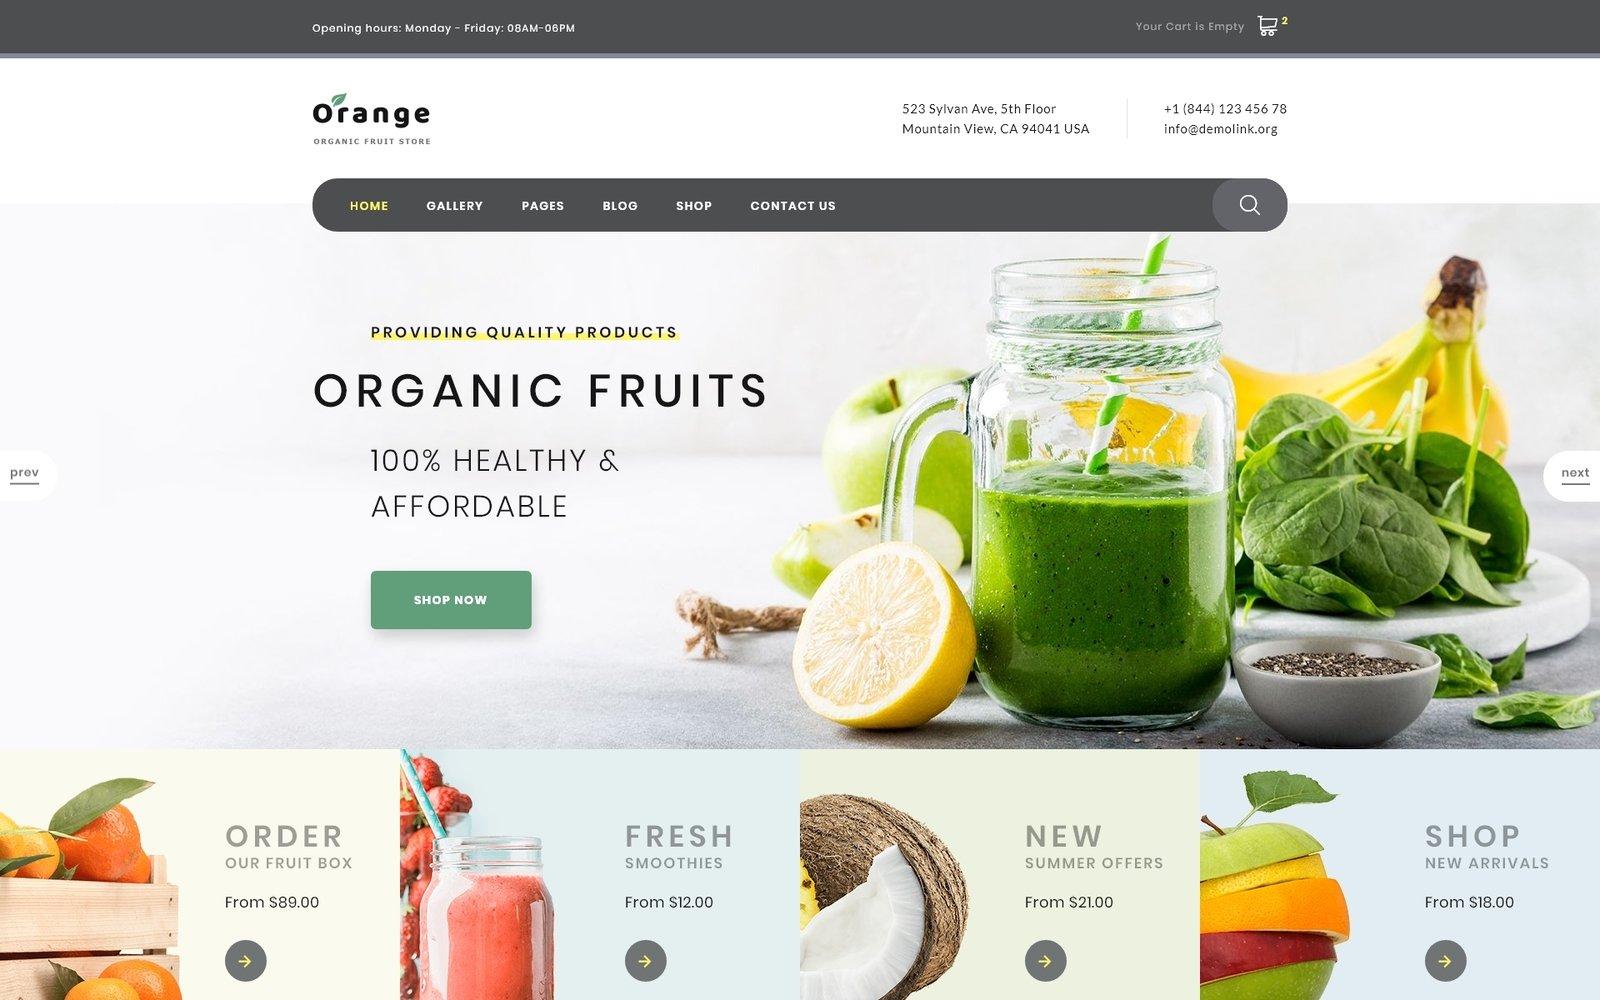 """Orange - Organic Fruit Farm"" modèle web adaptatif #94004 - screenshot"